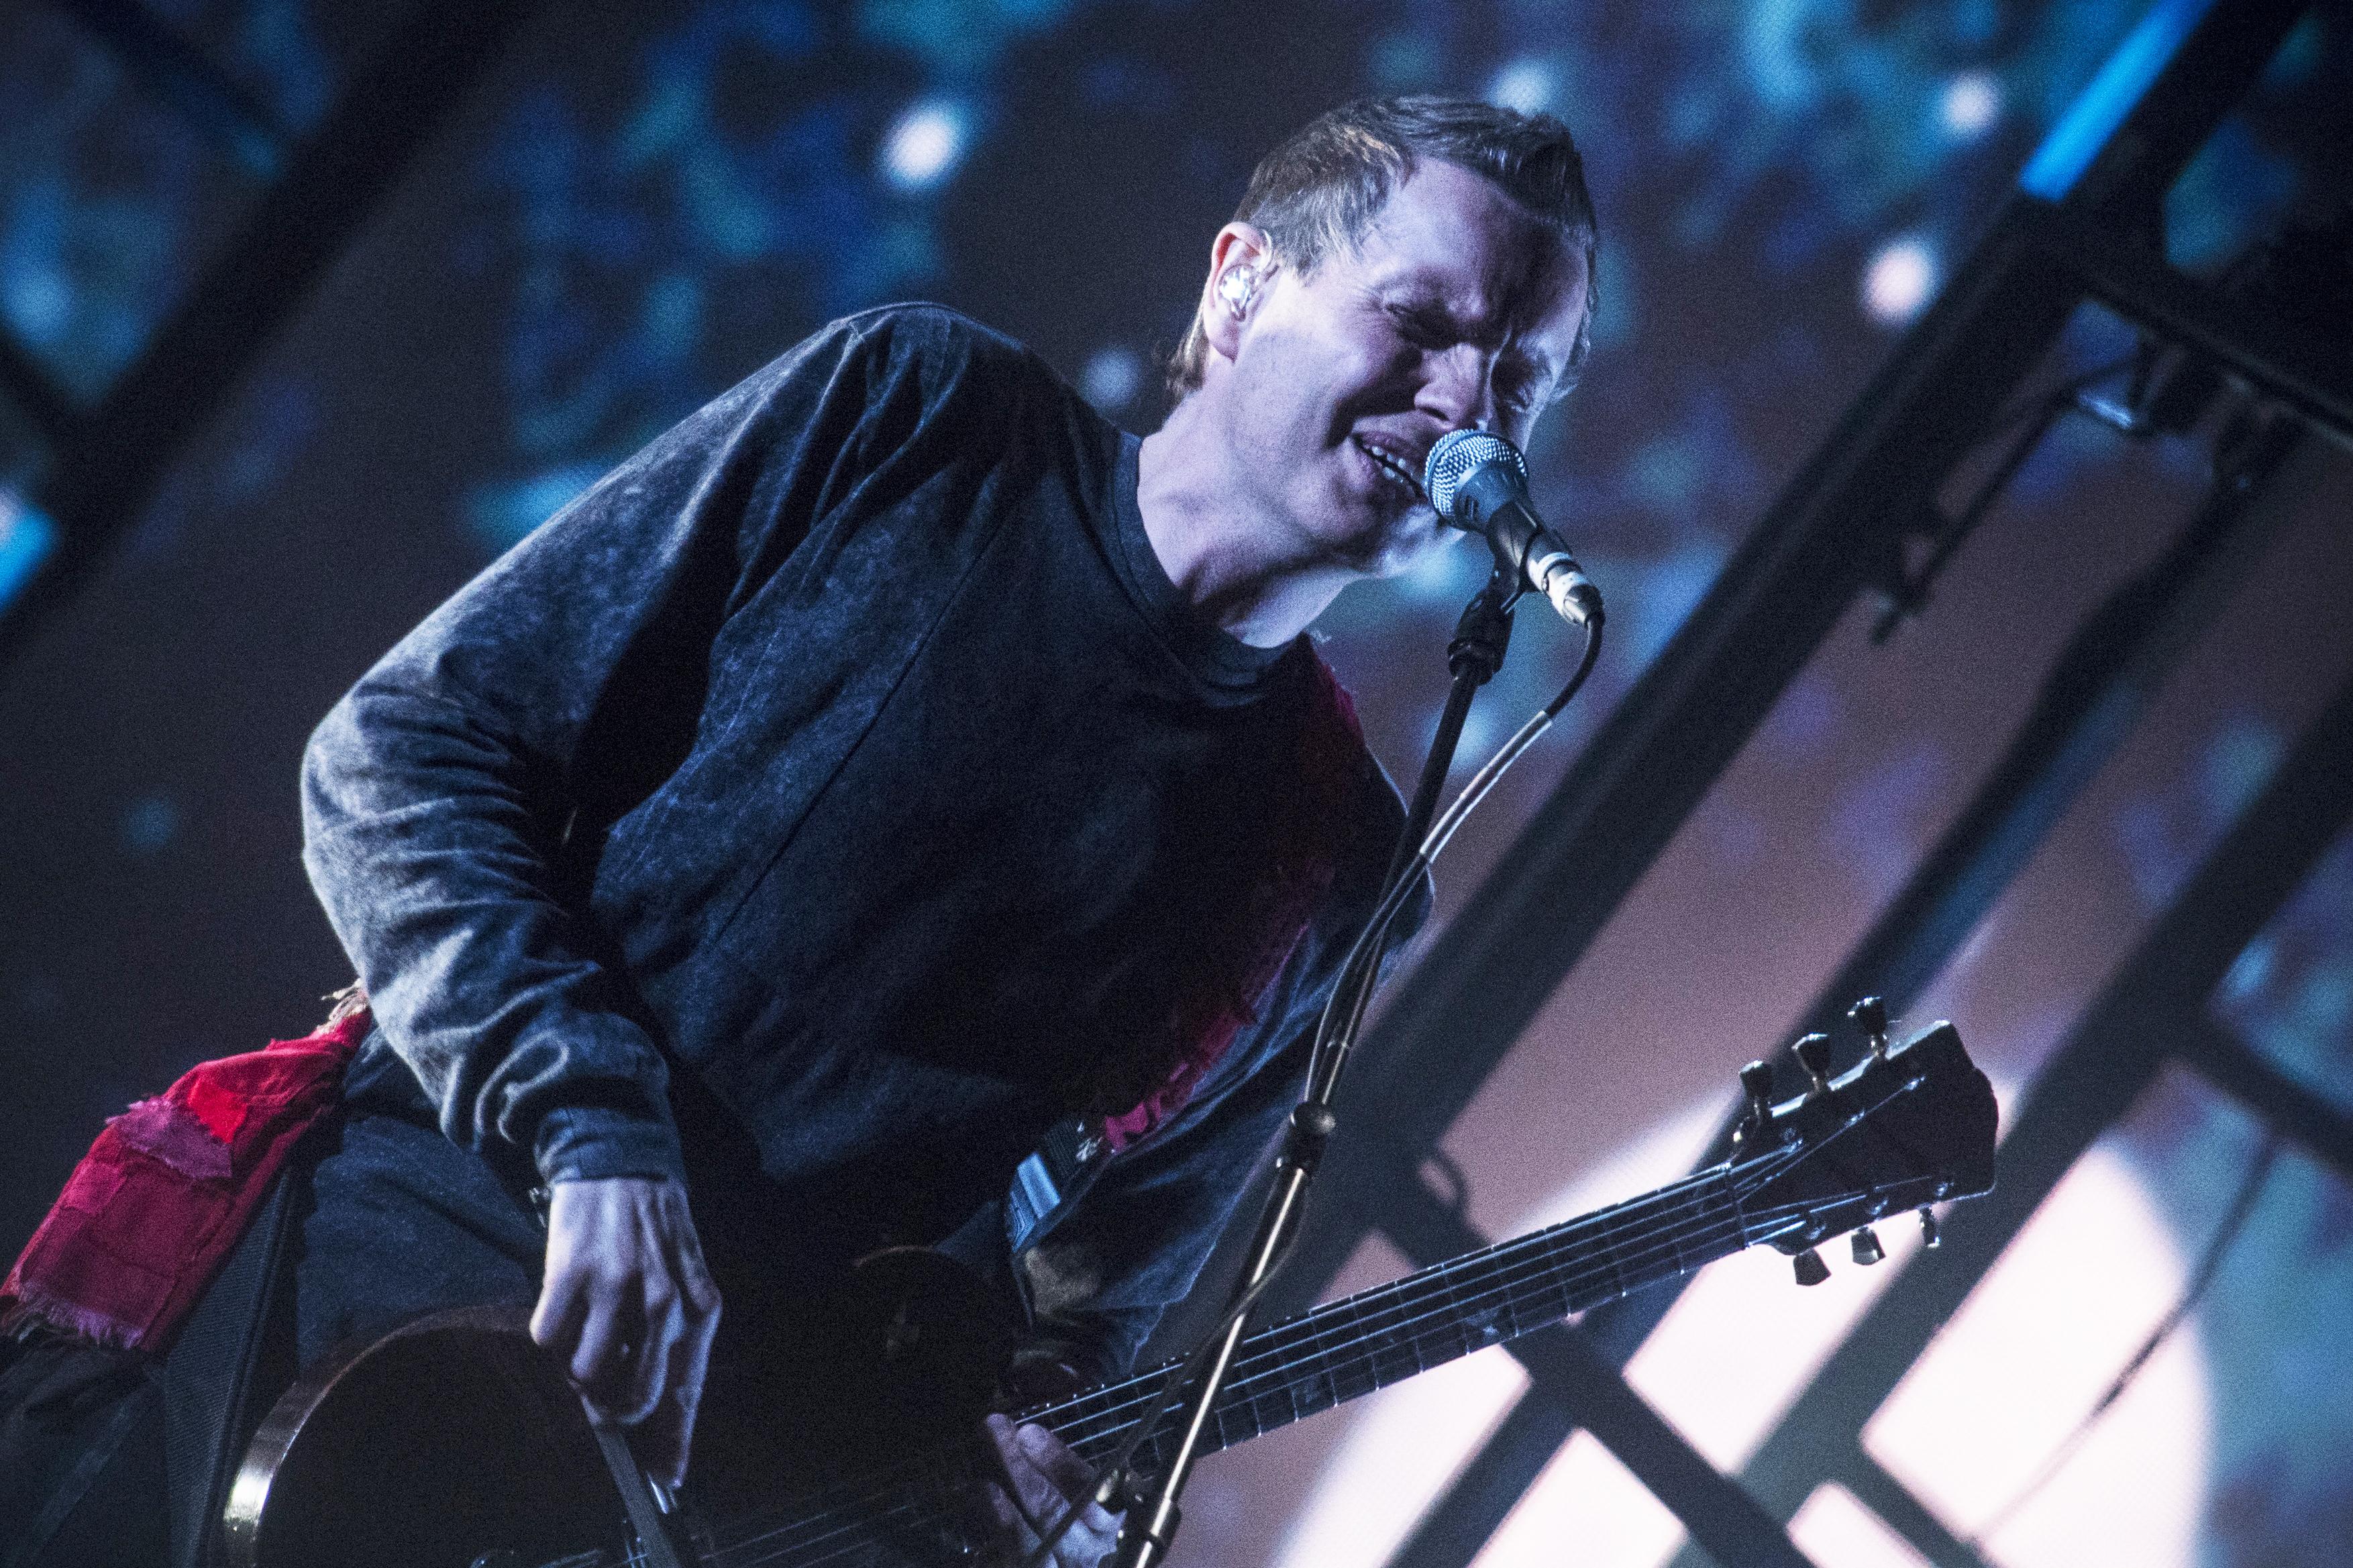 Jónsi Birgisson of Sigur Rós performs in Barcelona, Spain, on June 4, 2016.